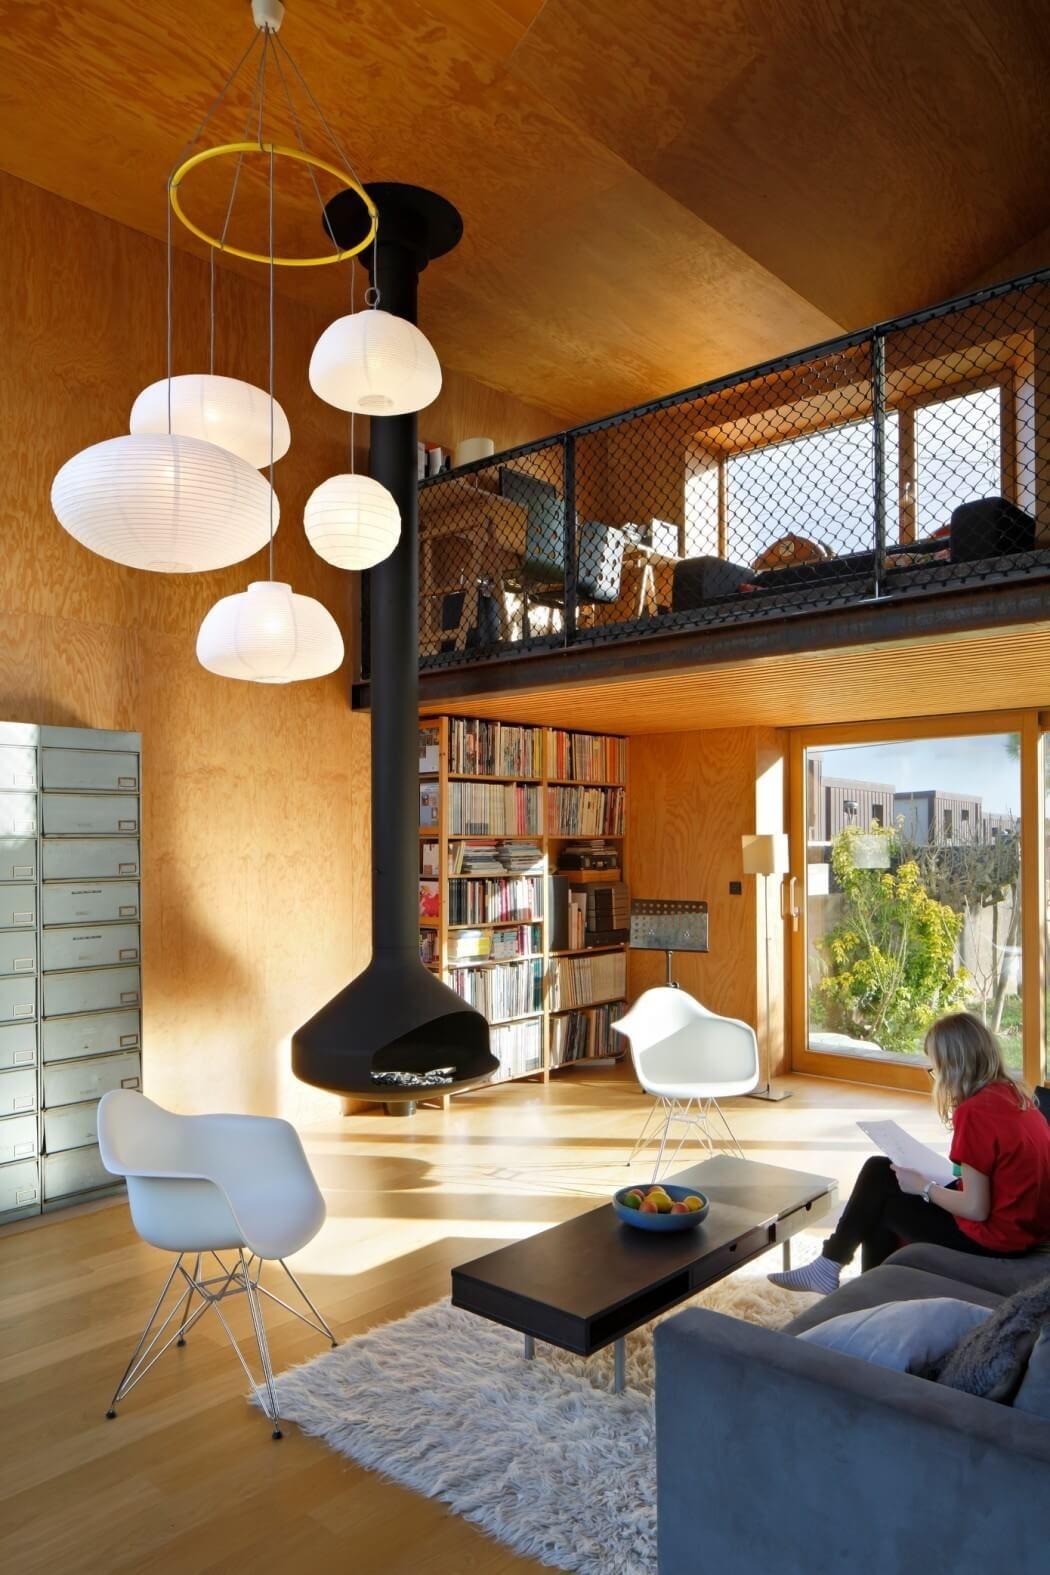 landscape-house-mabire-reich-architects-4 | Small Houses | Pinterest ...